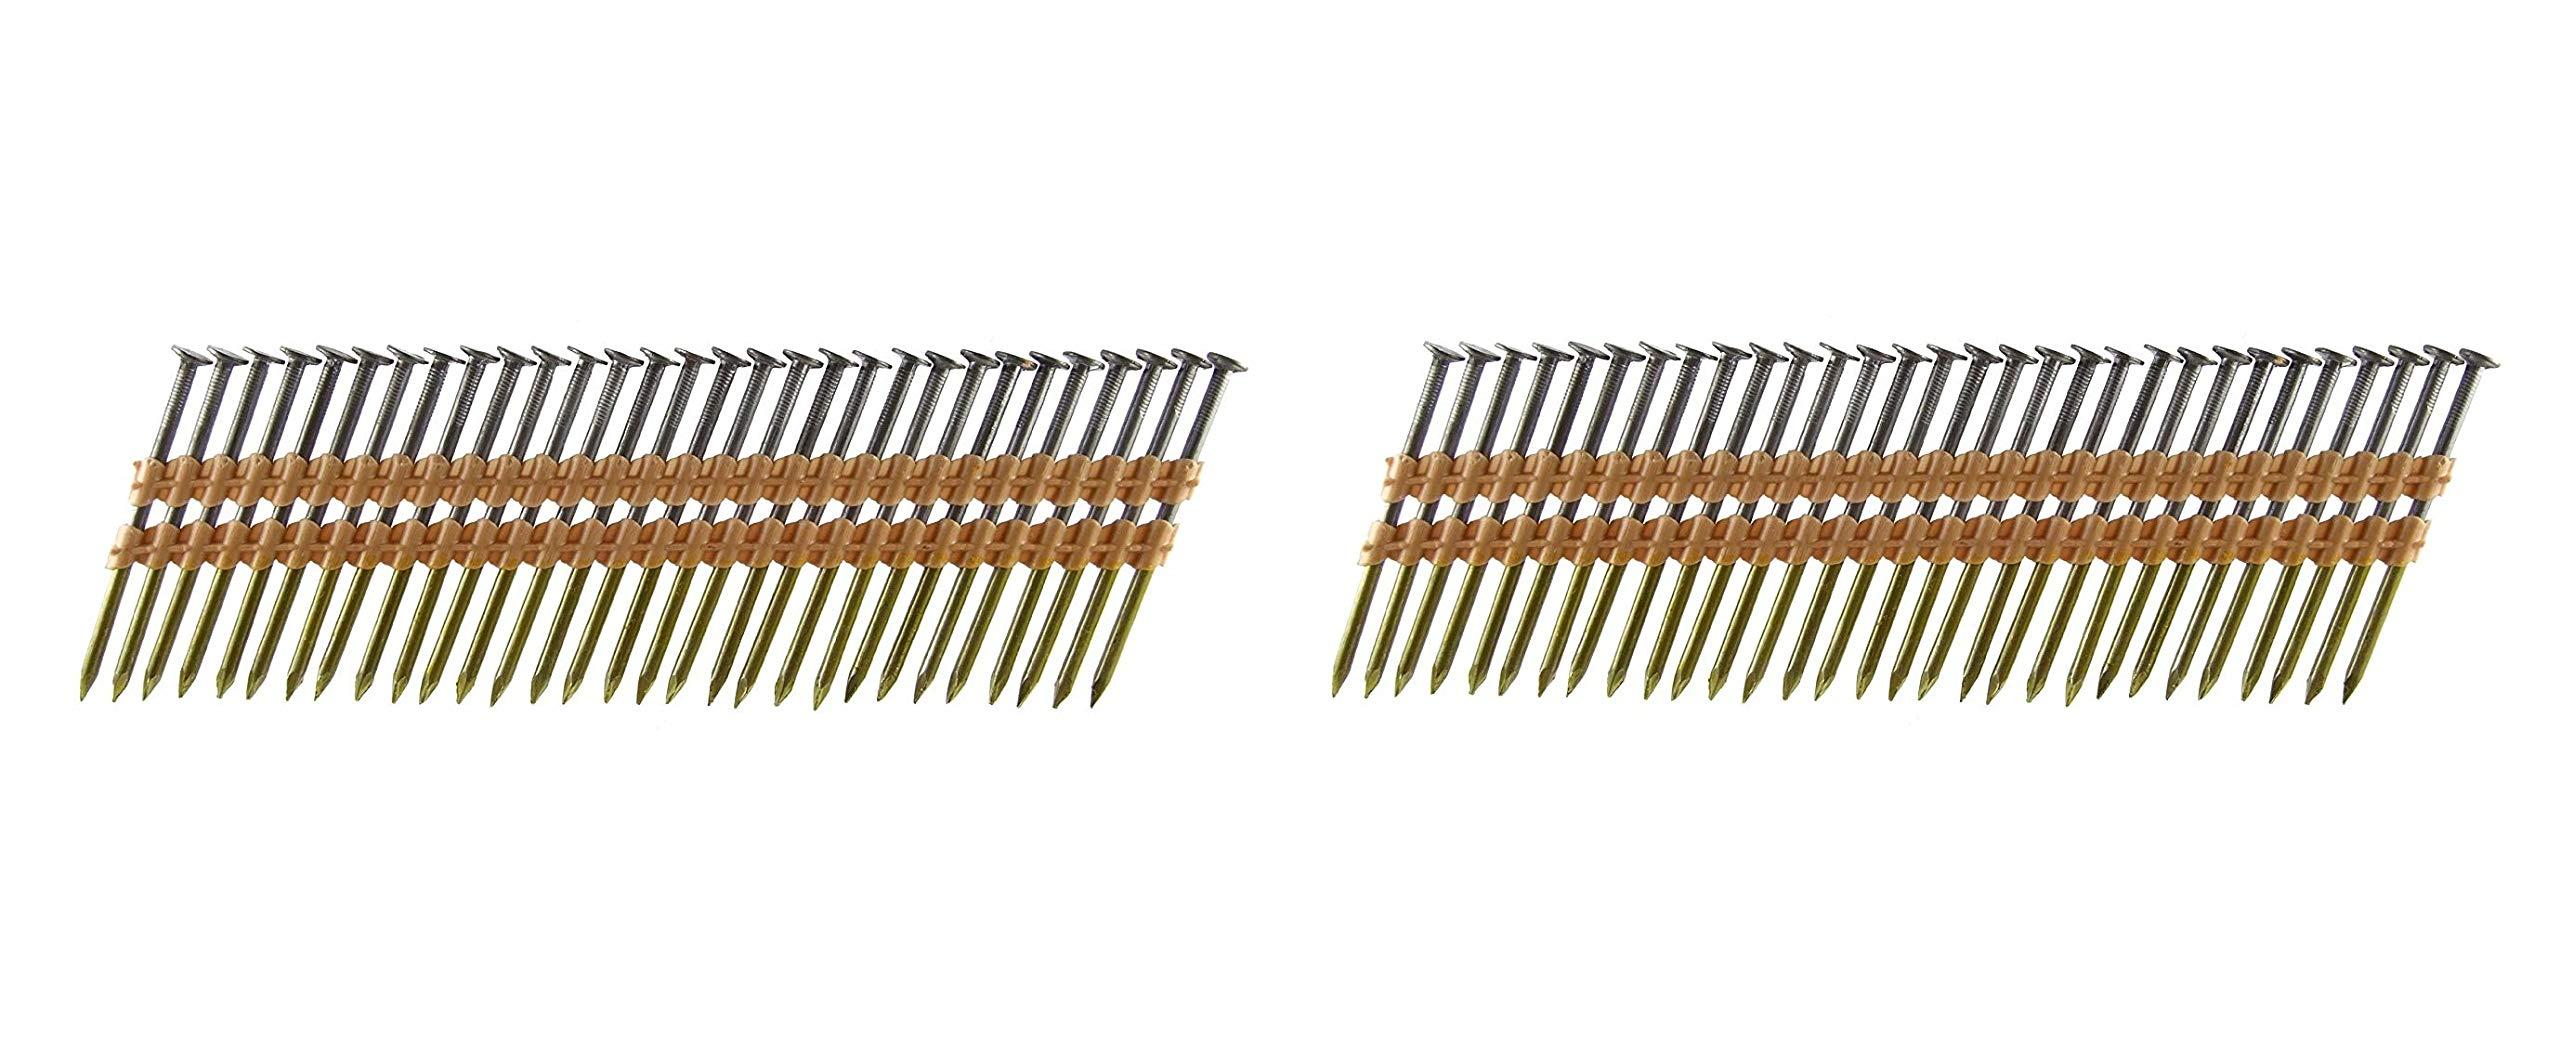 B&C Eagle A312X131/22 Round Head 3-1/2-Inch x .131 x 22 Degree Bright Smooth Shank Plastic Collated Framing Nails (2 X 500 per Box)